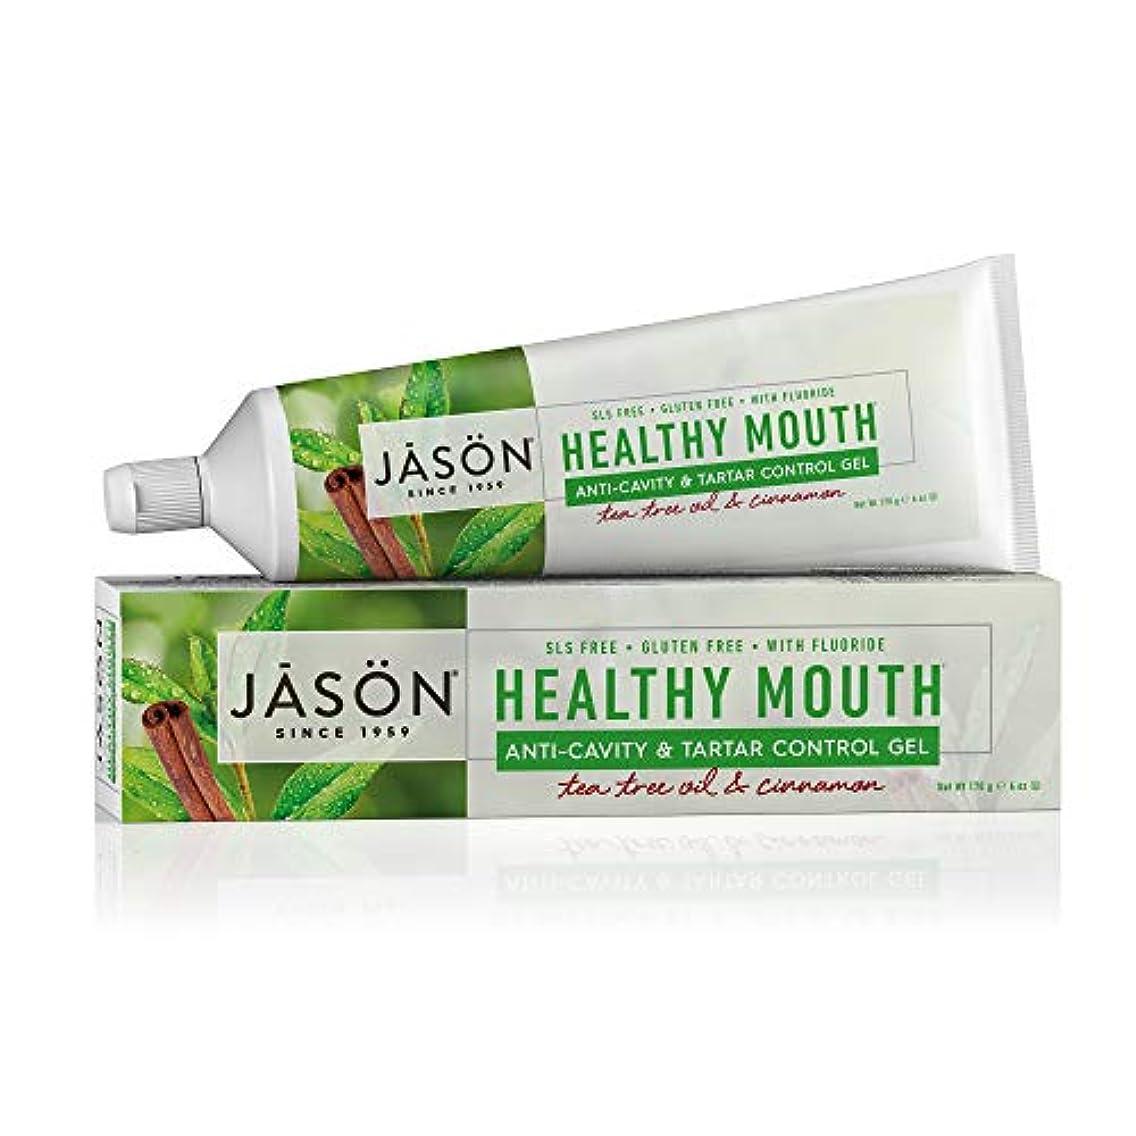 Jason 健康な口抗歯垢&タルタルコントロールハミガキティーツリーオイル&シナモン、6オンス